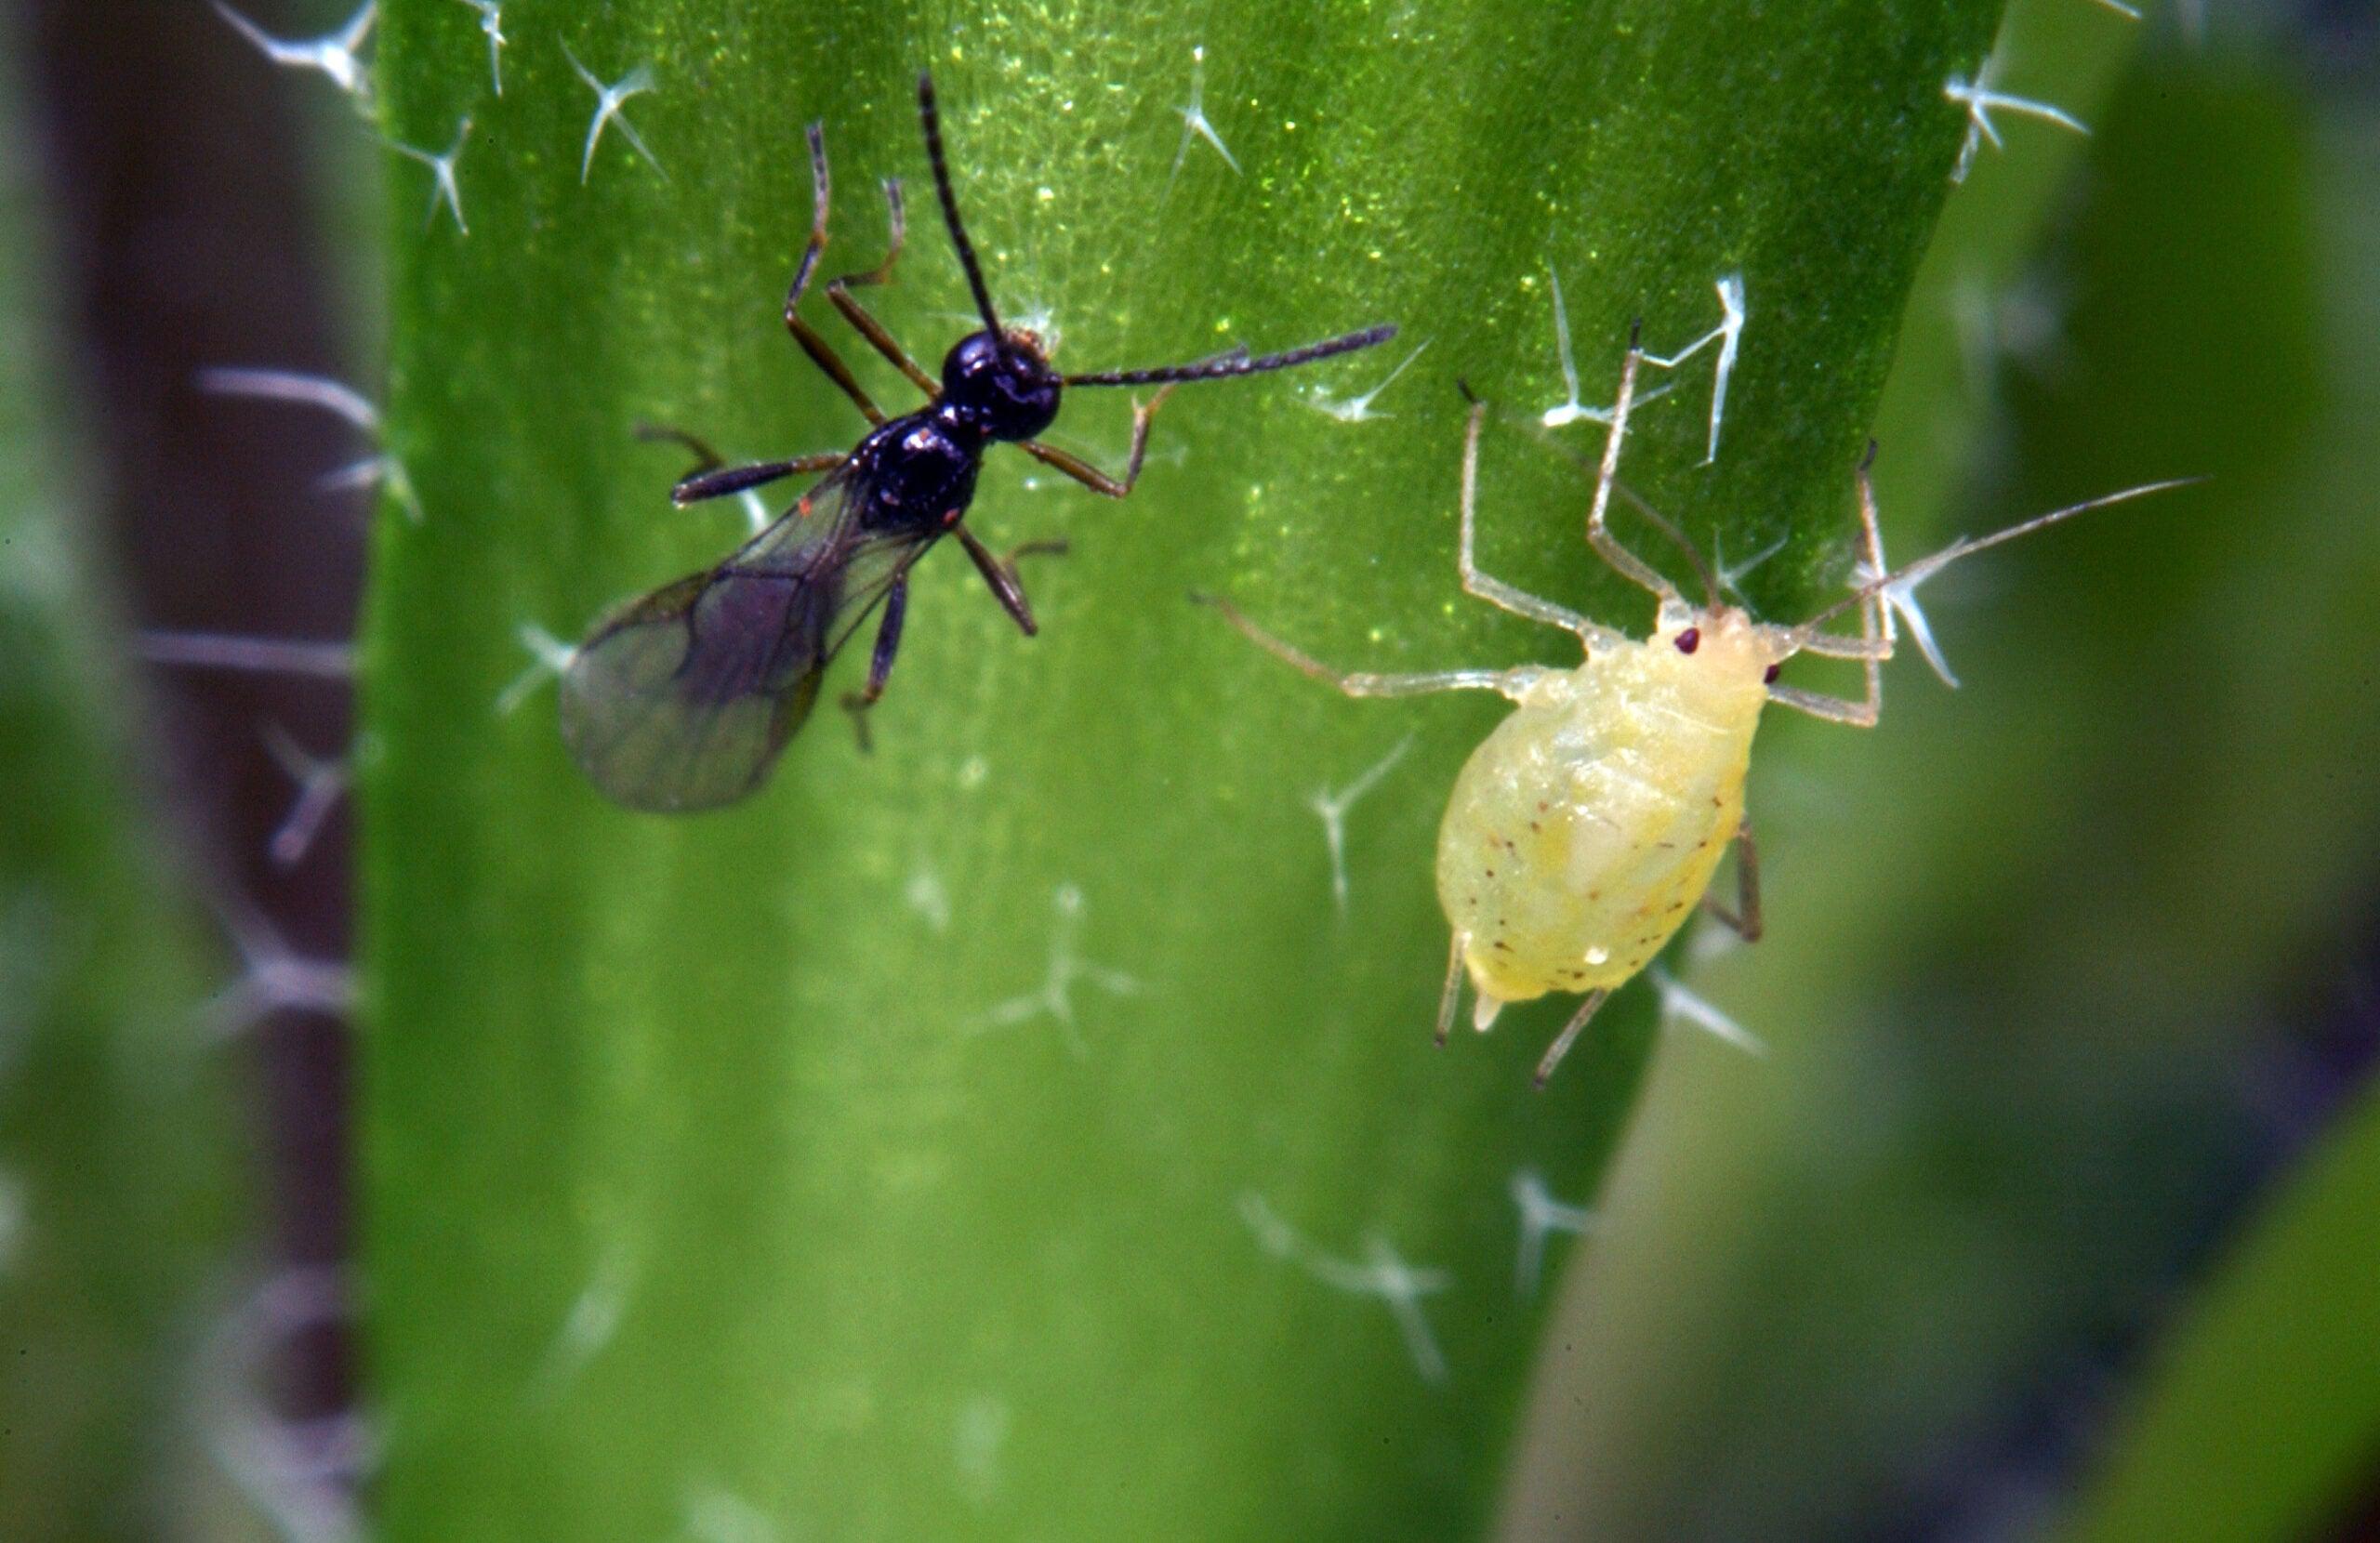 Swarms of Engineered Voodoo Wasps Will Seek and Destroy Crop Pests